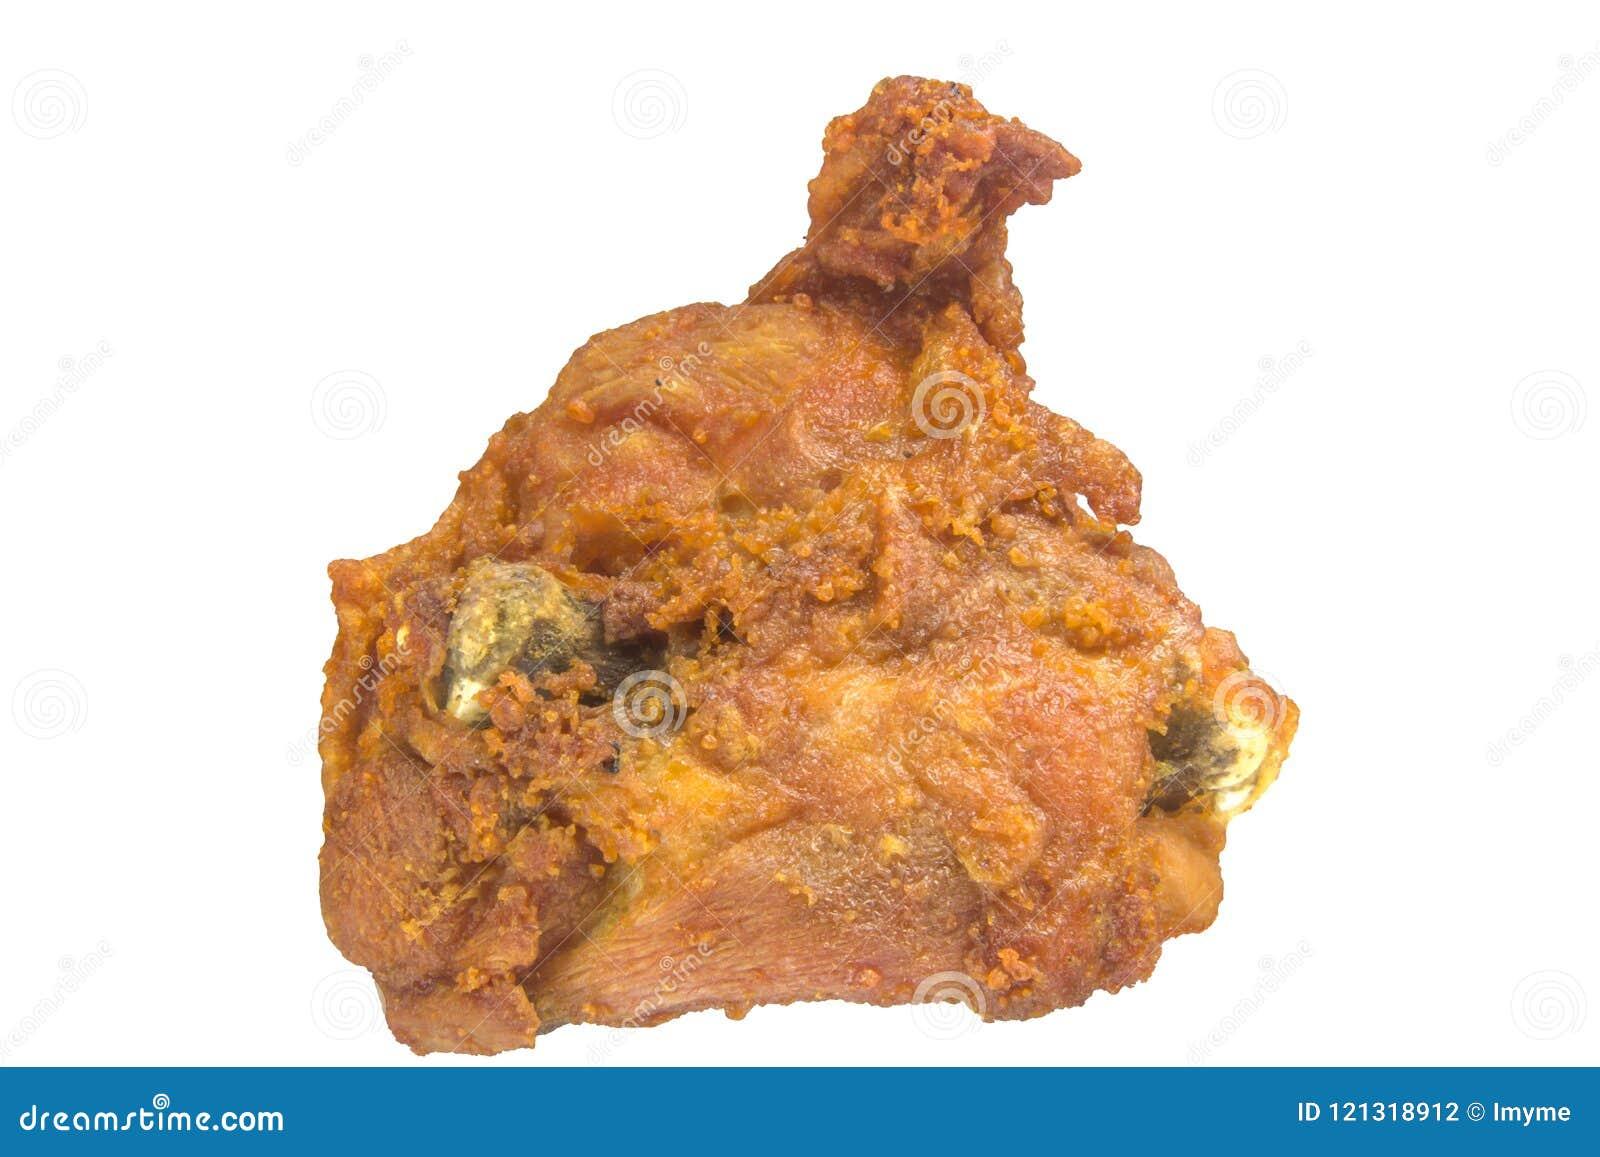 Fried Chicken Thigh curruscante